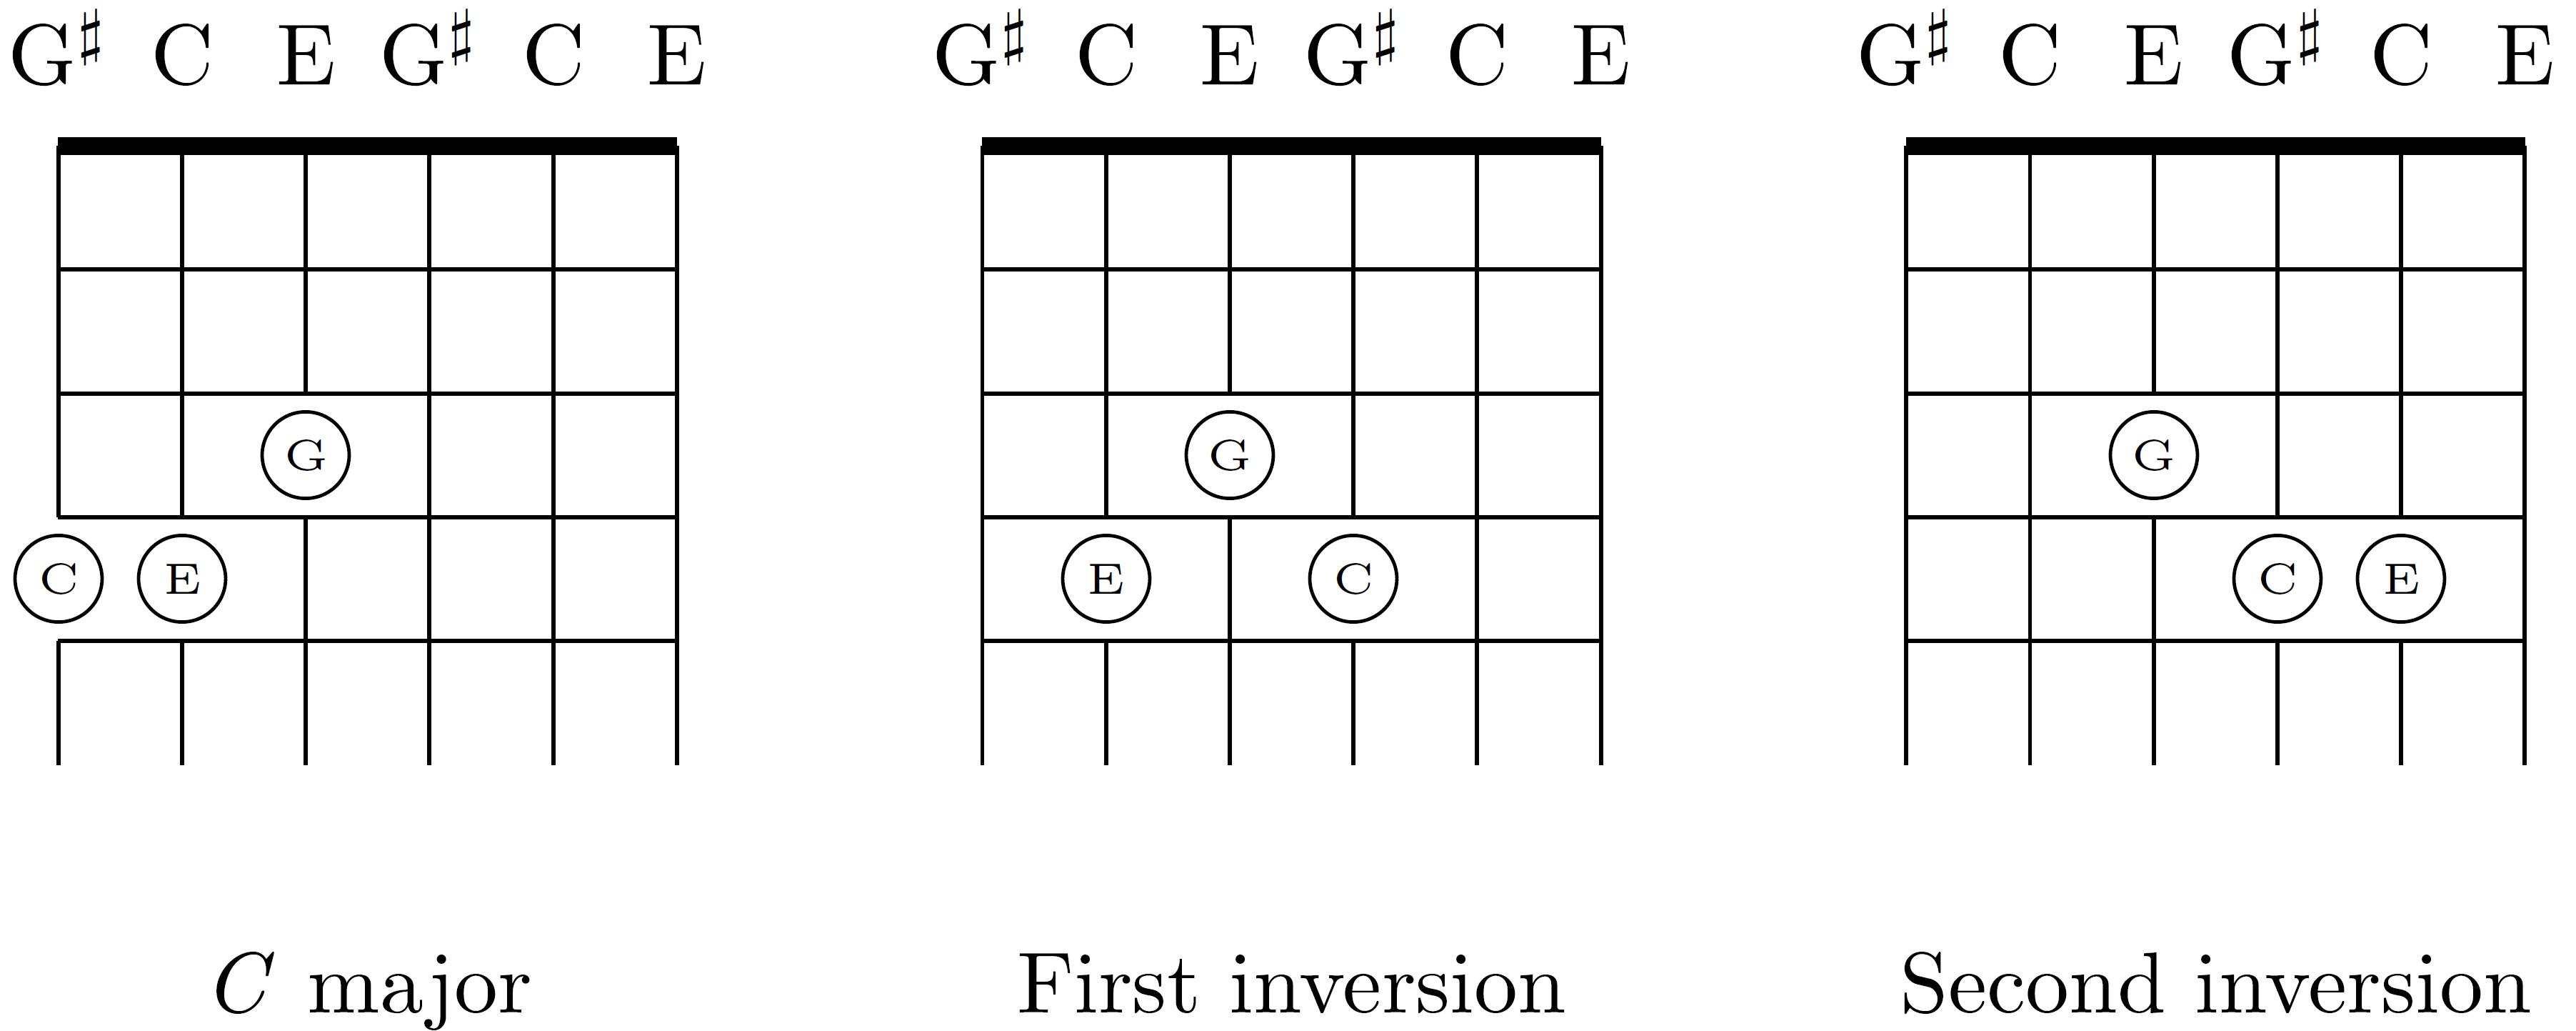 Pete Townshend Windmill Guitar Strum Chords vertically shift.